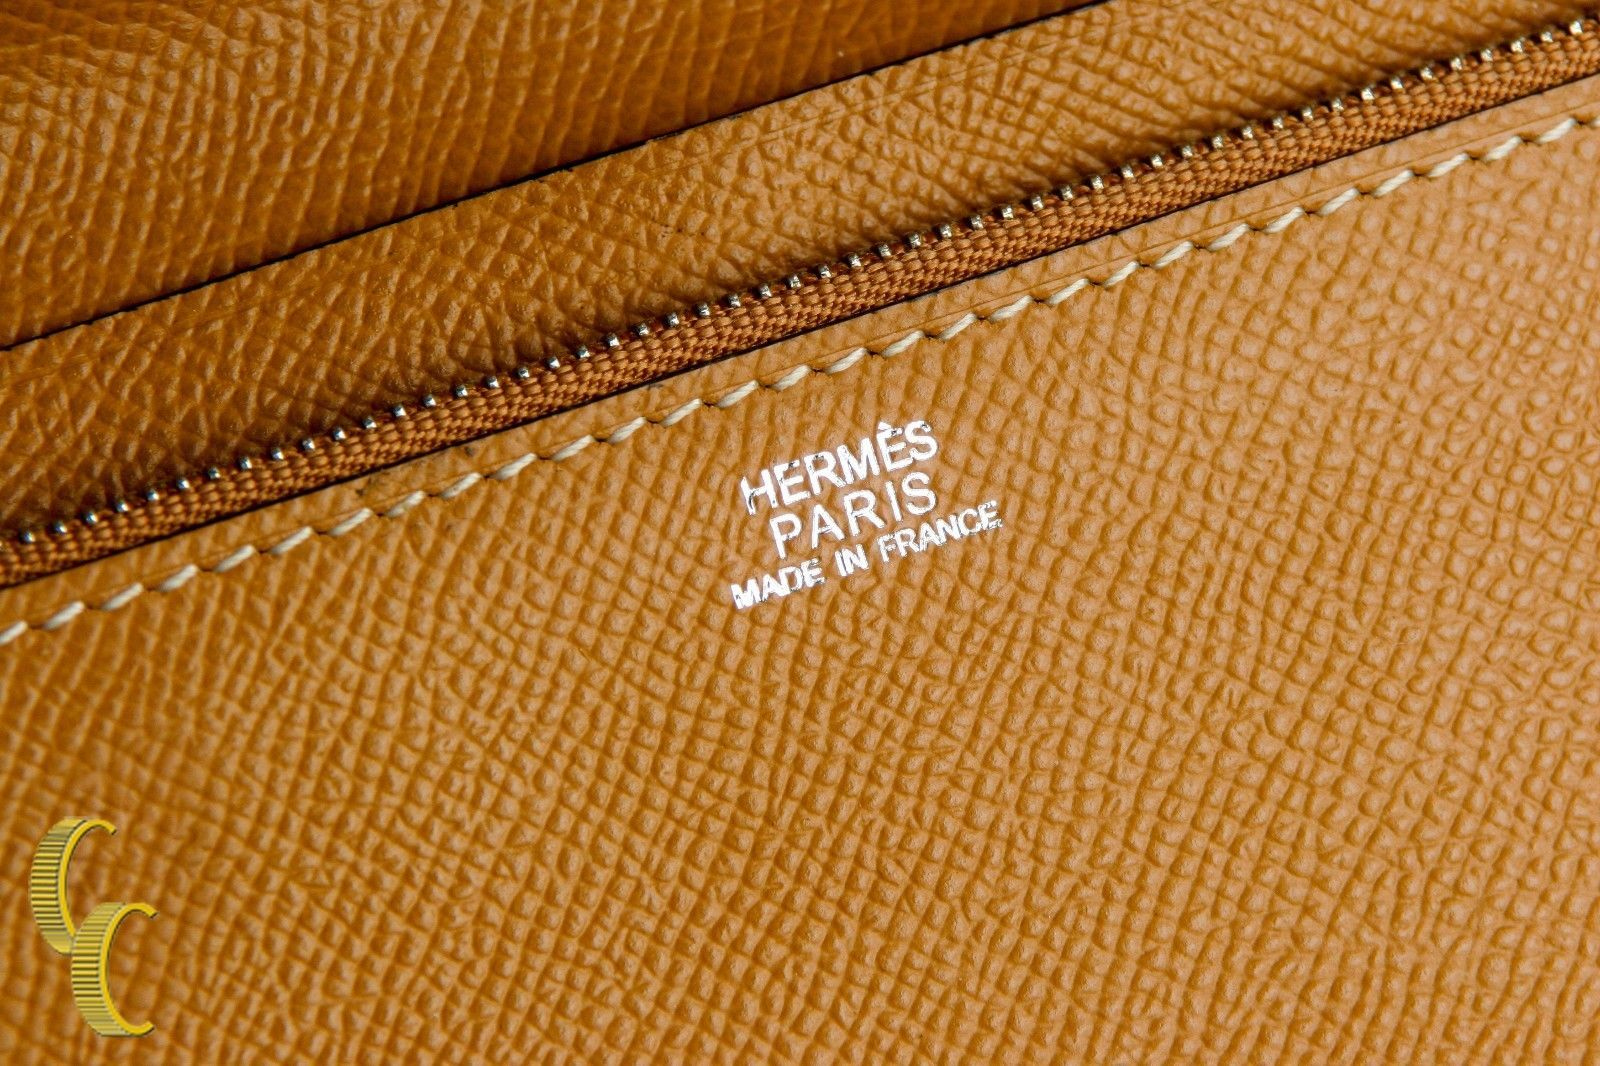 HERMES Paris Chevre Mysore Azap GM Combined Wallet in Tan